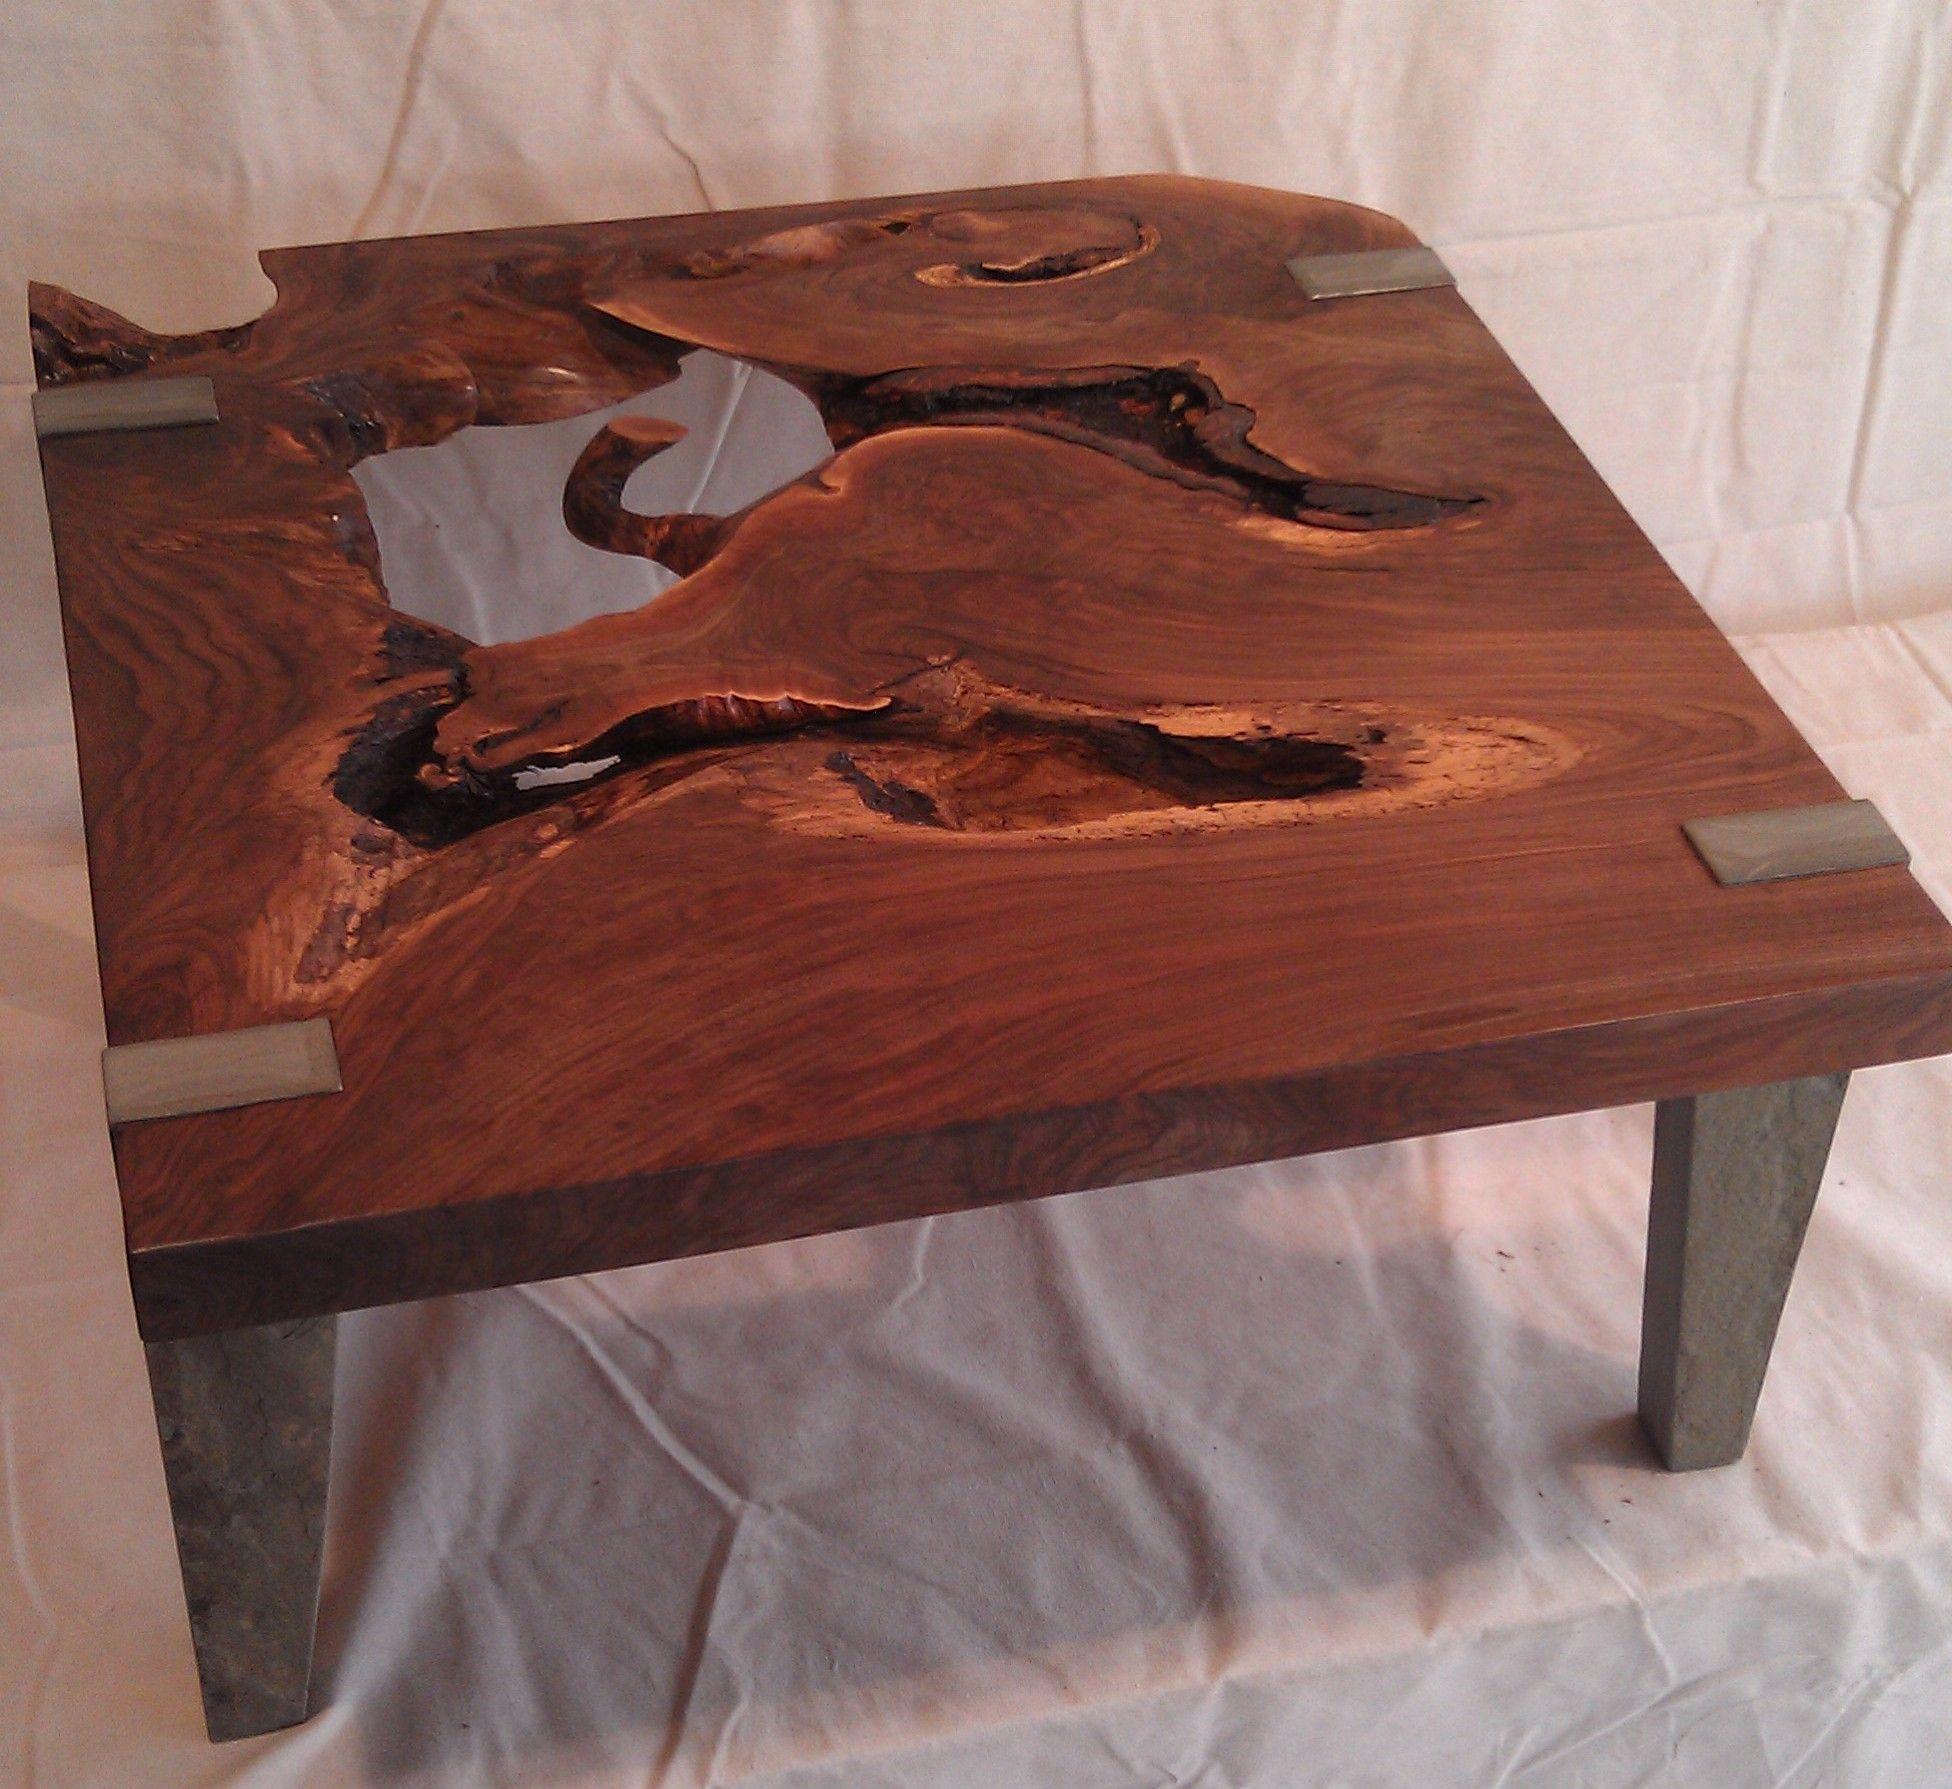 Beautiful Hawaiian Koa Wood Coffee Table From Lewiskoa Co At Gotkoa Com Koa Wood Coffee Table Wood Wood Furniture [ 1066 x 1334 Pixel ]